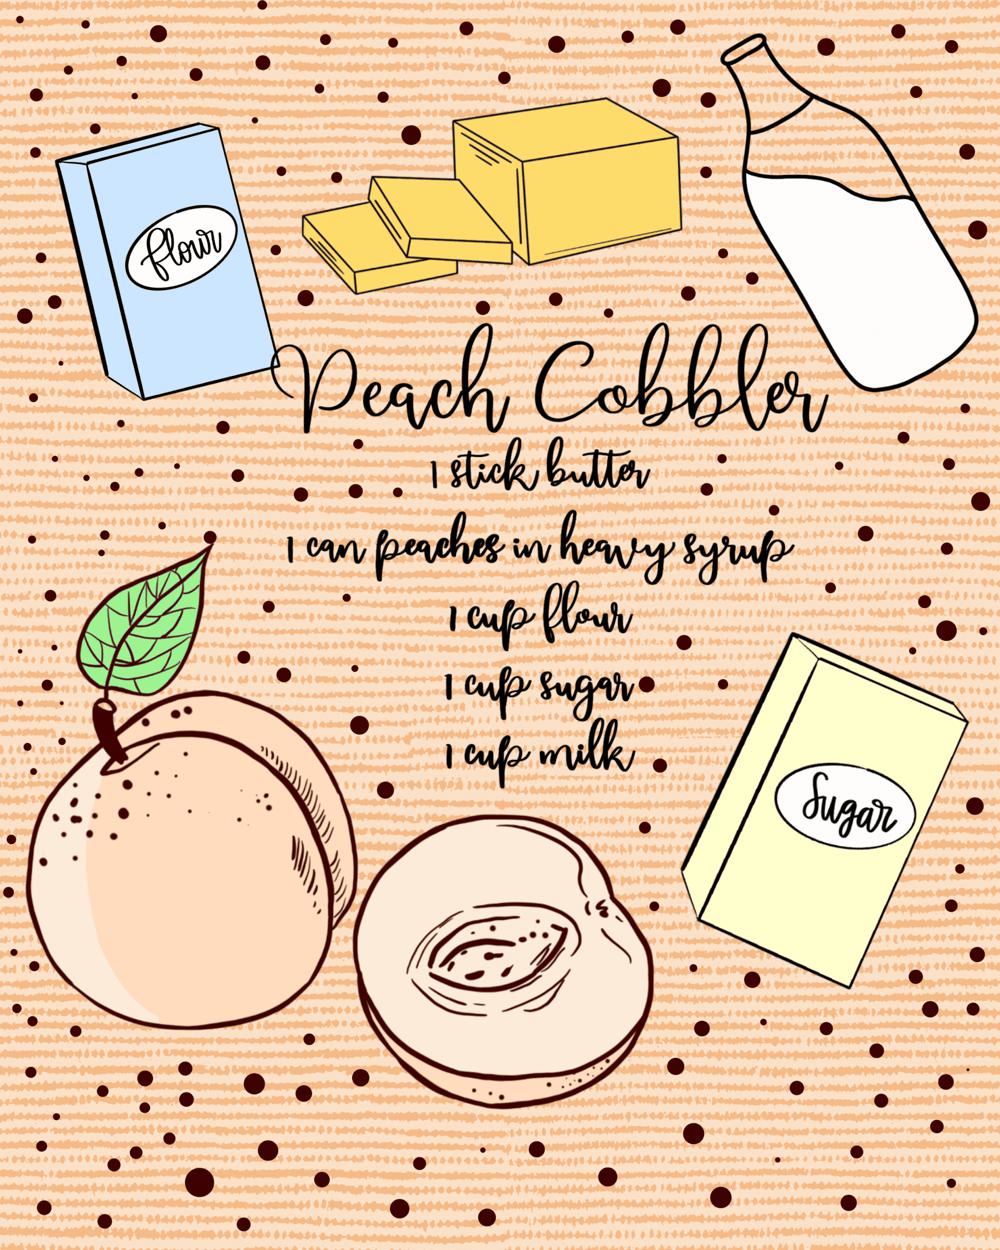 Peach Cobbler - image 1 - student project